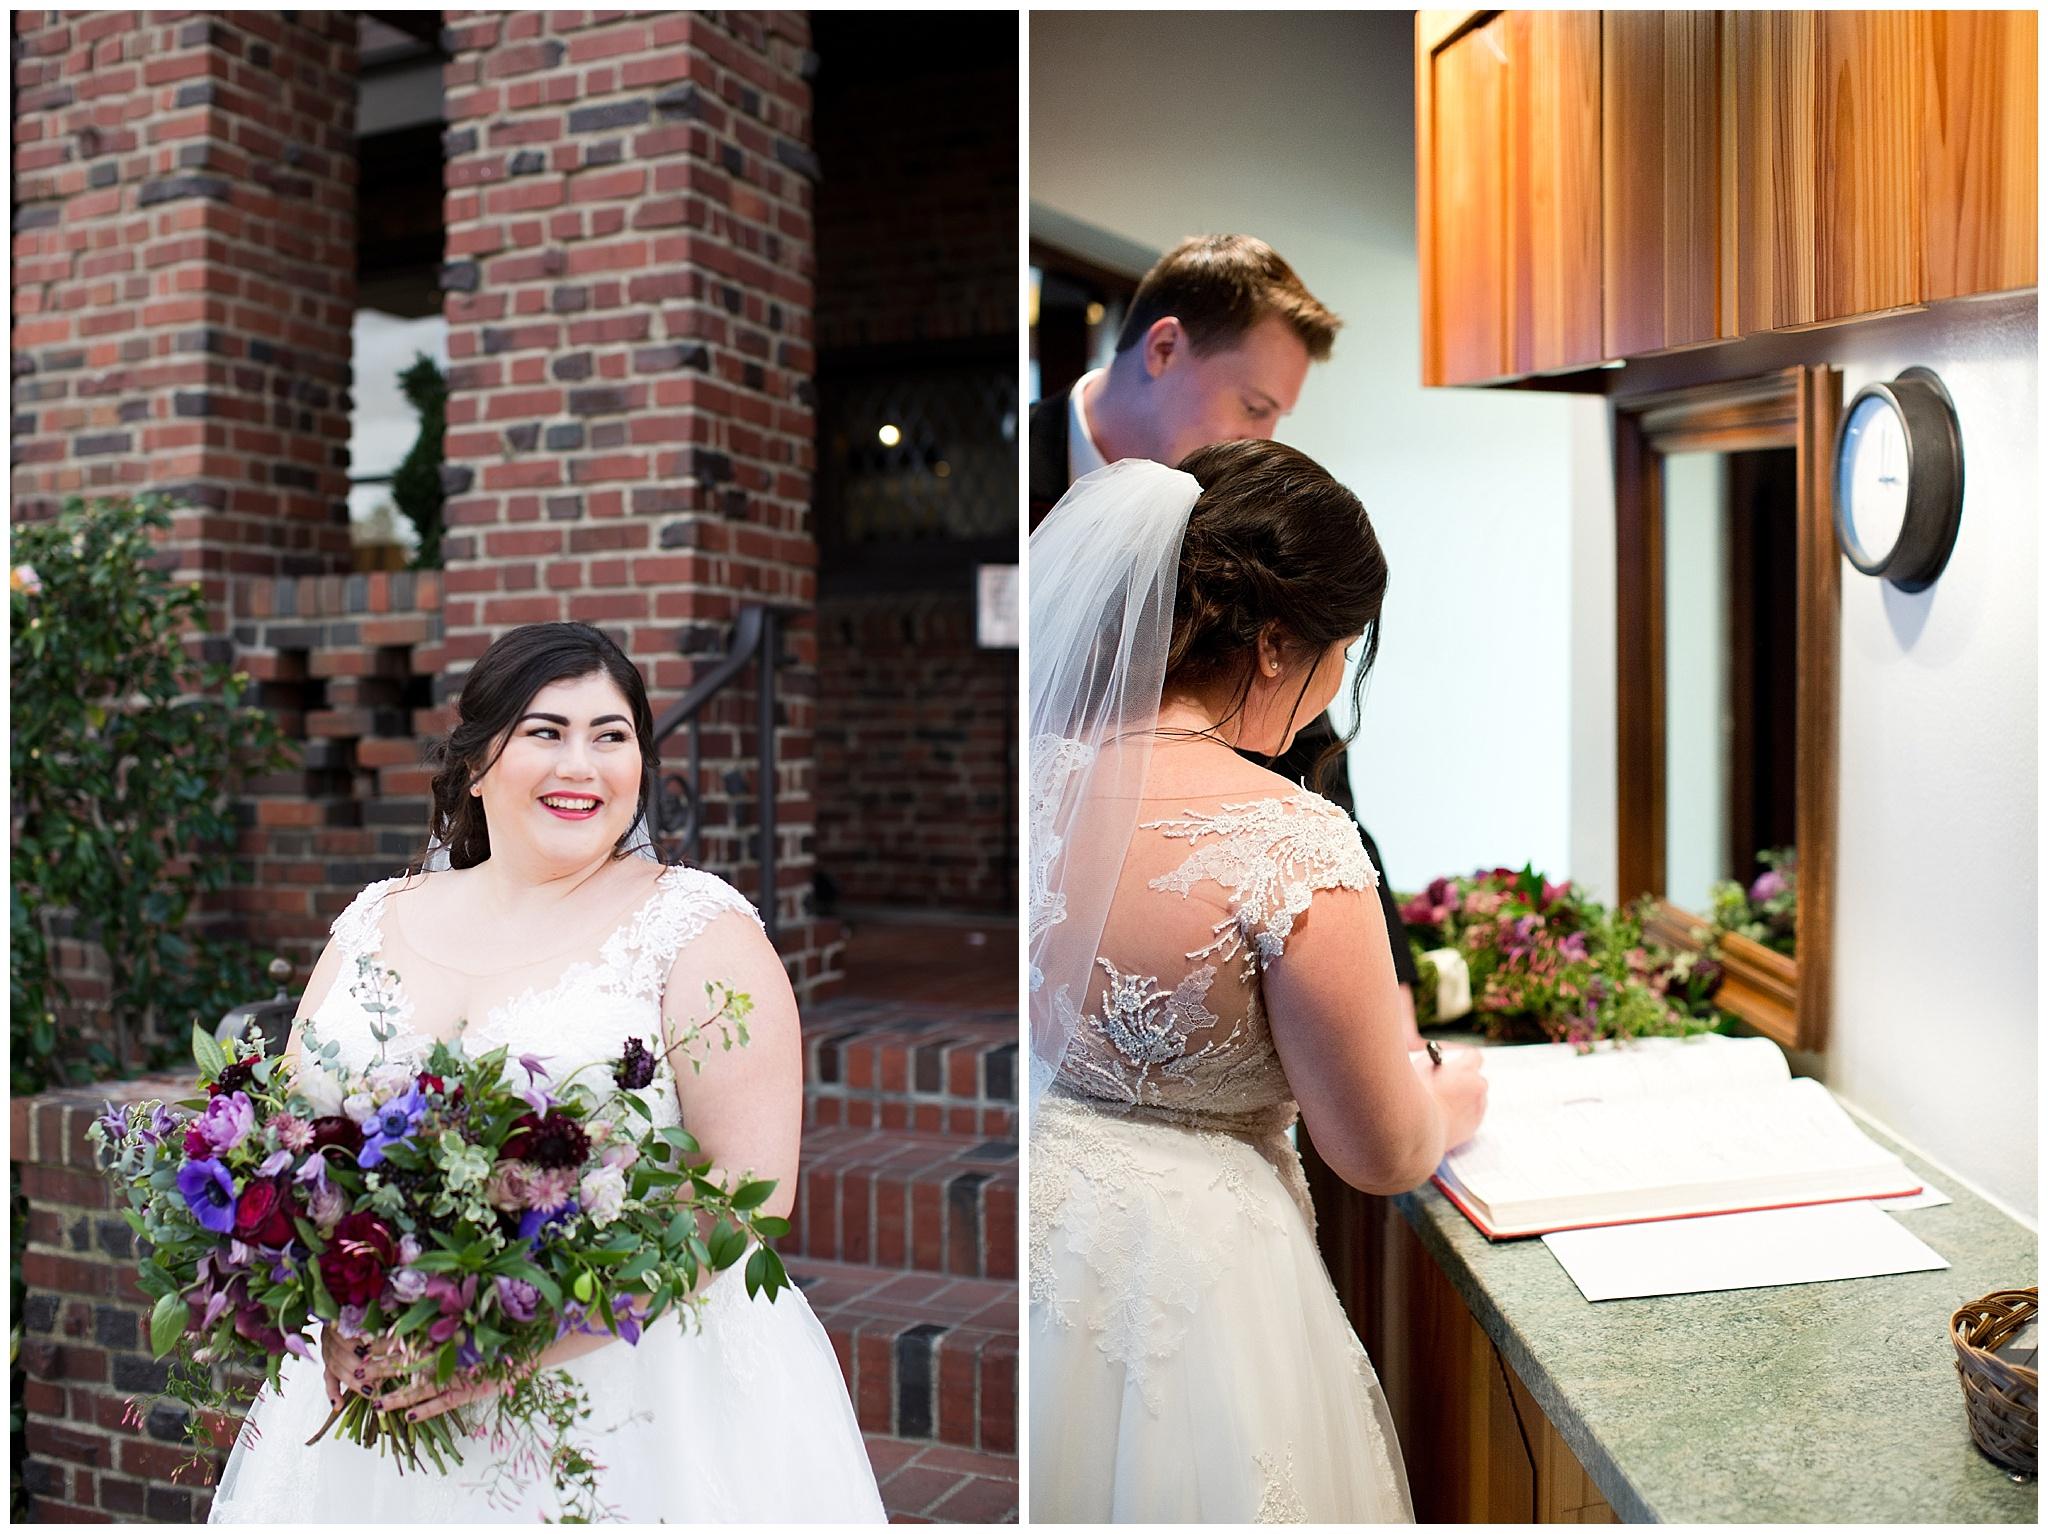 Carol_and_Grant_Wedding_3-3-18-7415.jpg